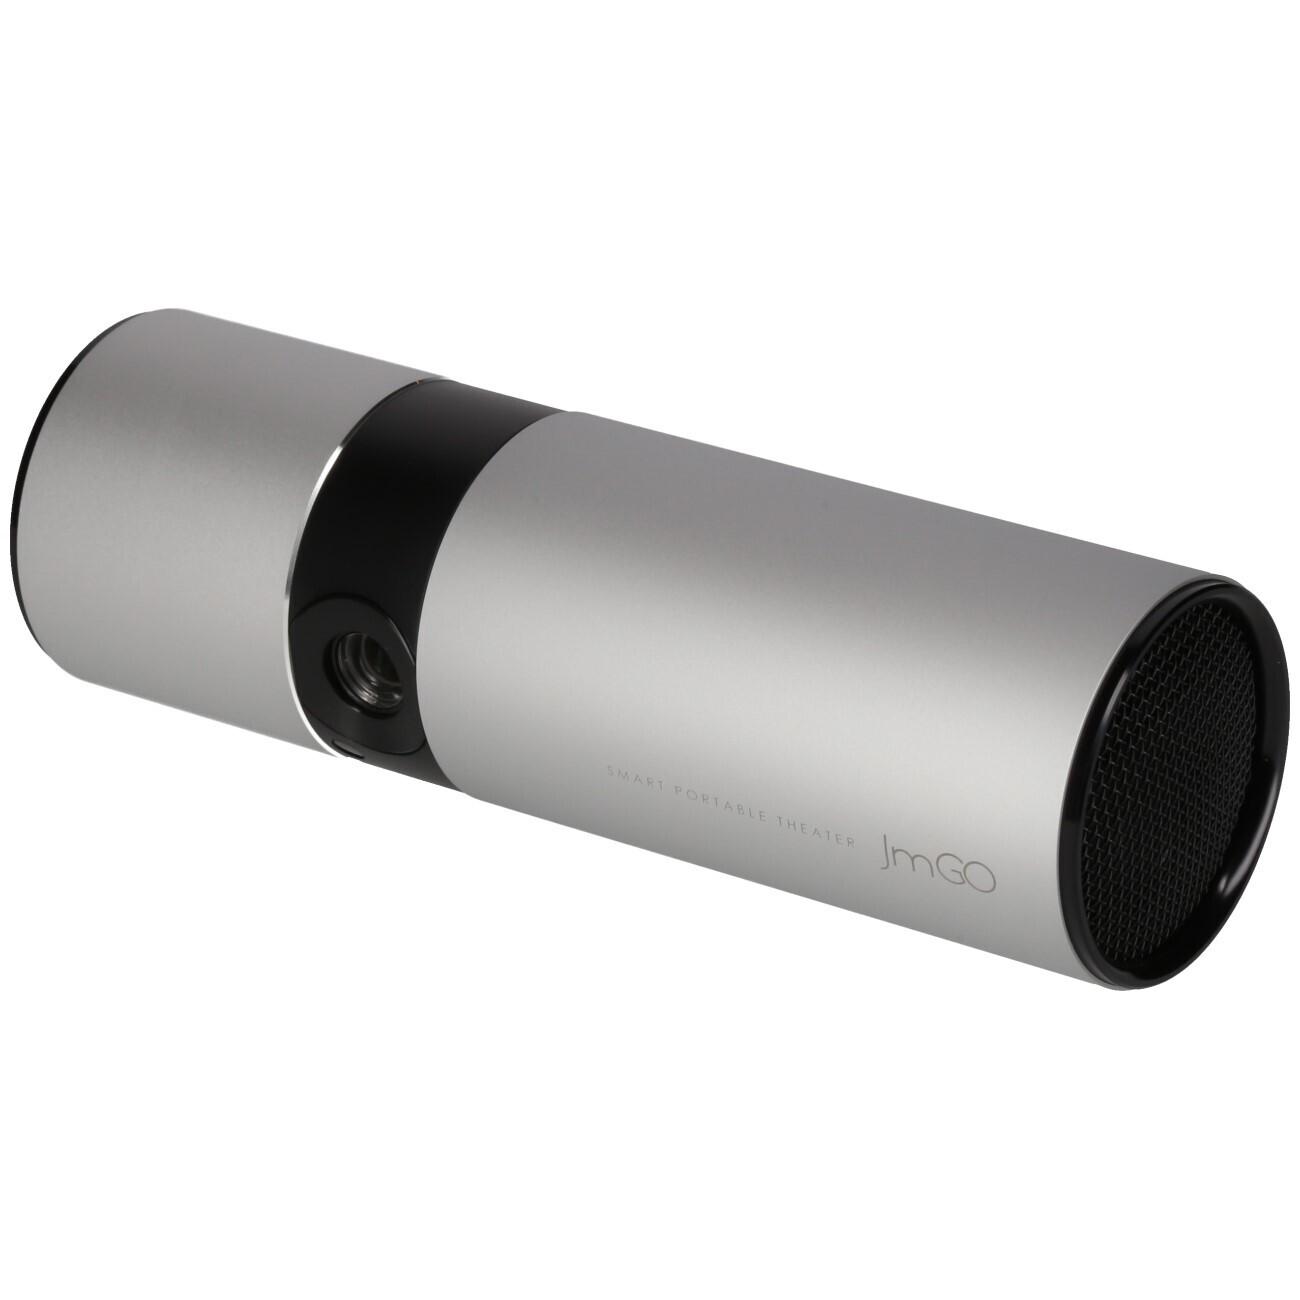 JmGO View P2 Mini Beamer mit 250 ANSI-Lumen und WXGA Auflösung